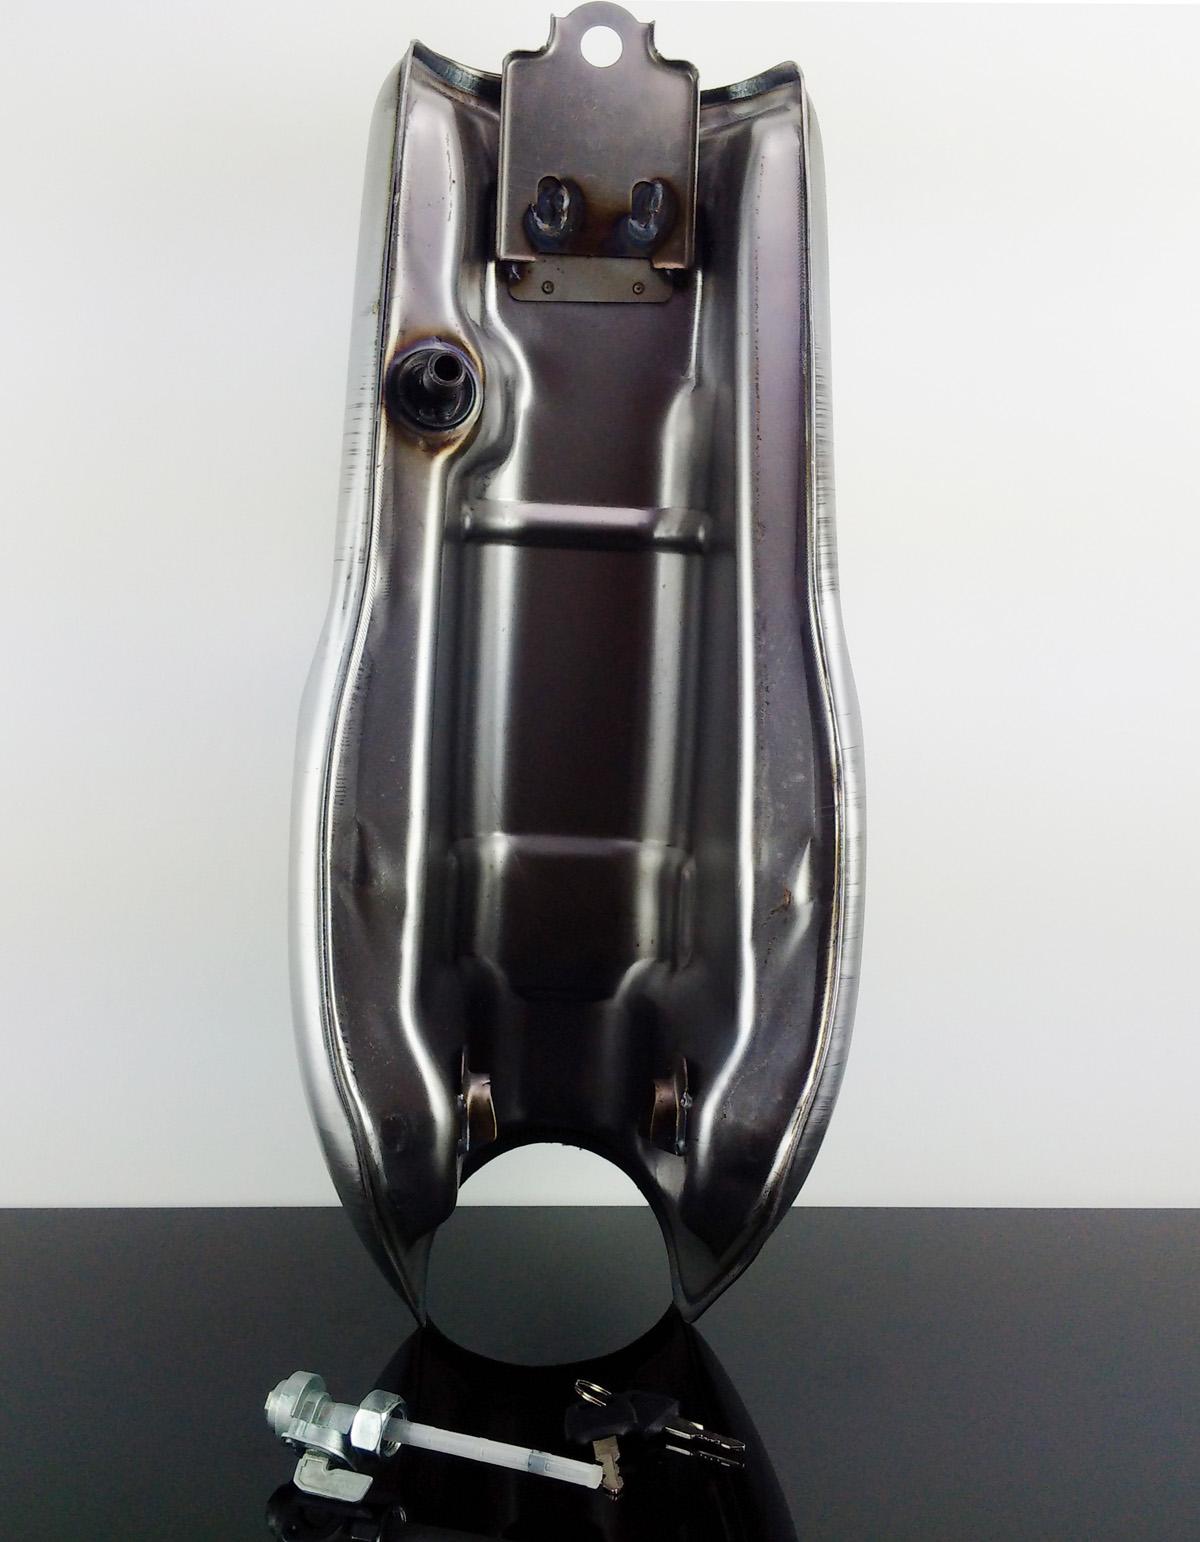 cafe racer universal tank unlackiert ebay. Black Bedroom Furniture Sets. Home Design Ideas